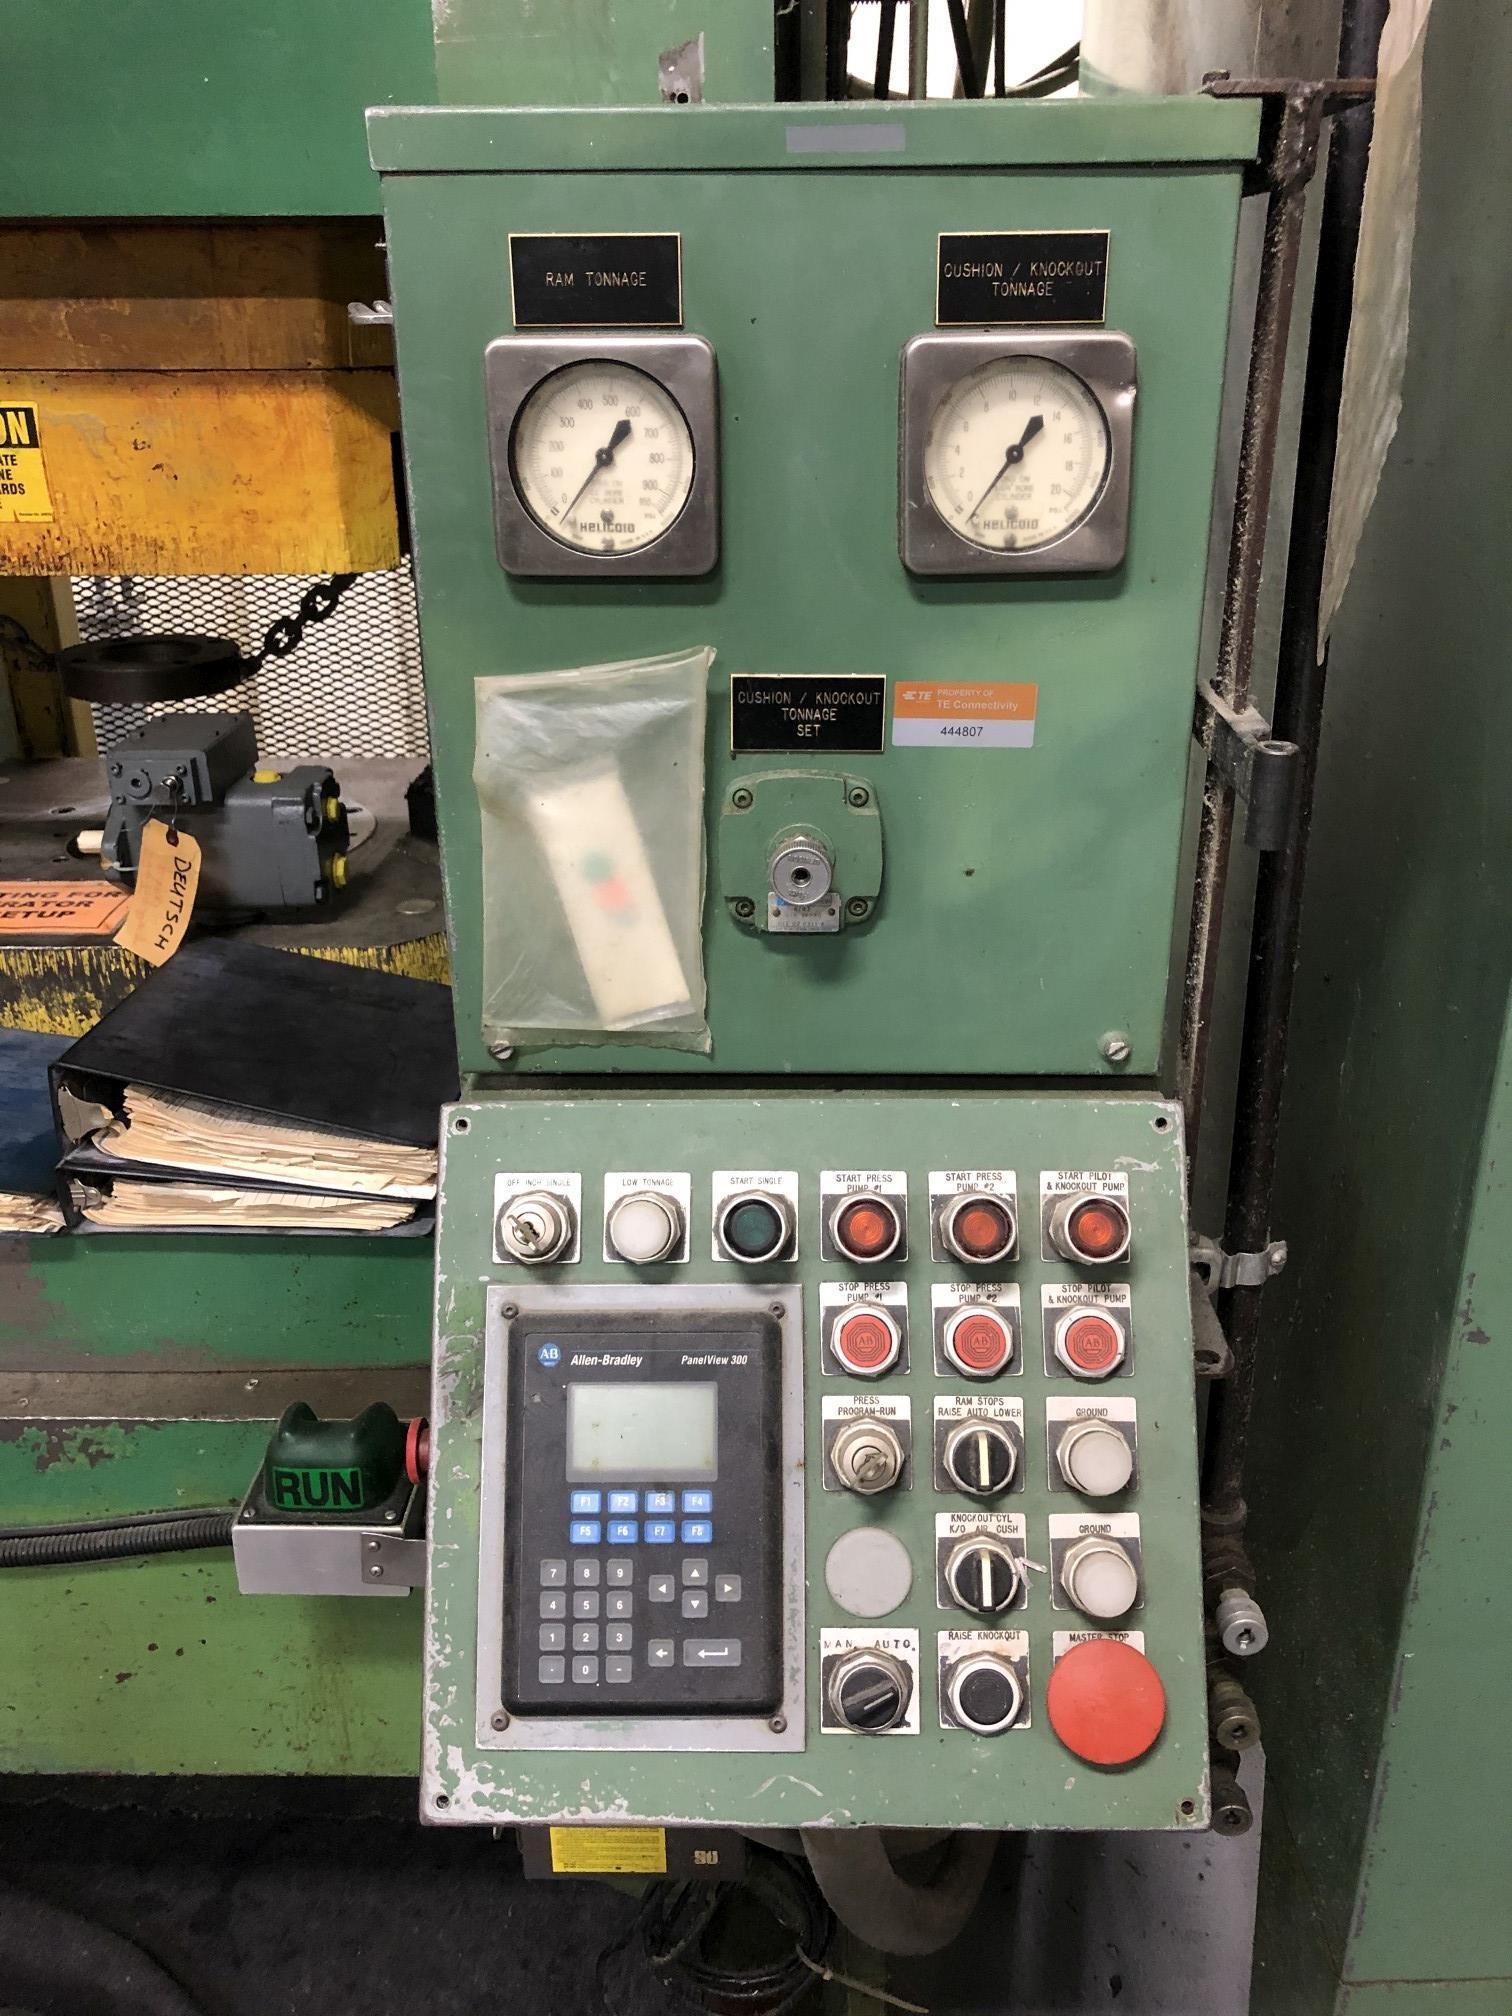 570 Ton Advanced Machine Design Straight Side Press - Image 6 of 15